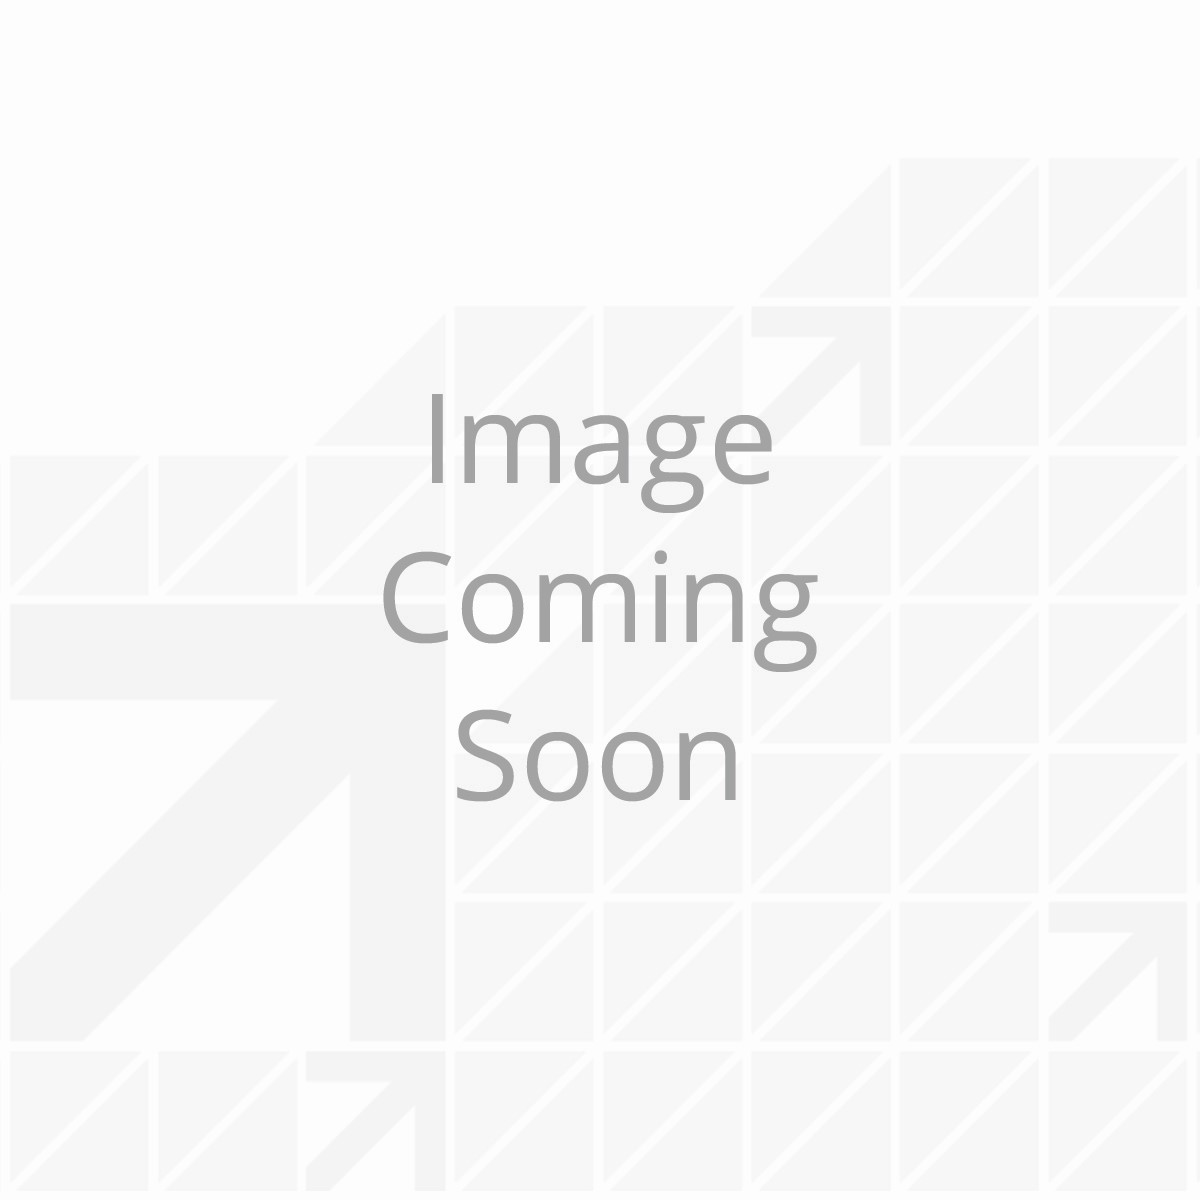 17' Power & Hybrid Awning Roller Assembly - Prepflex Blue Fade